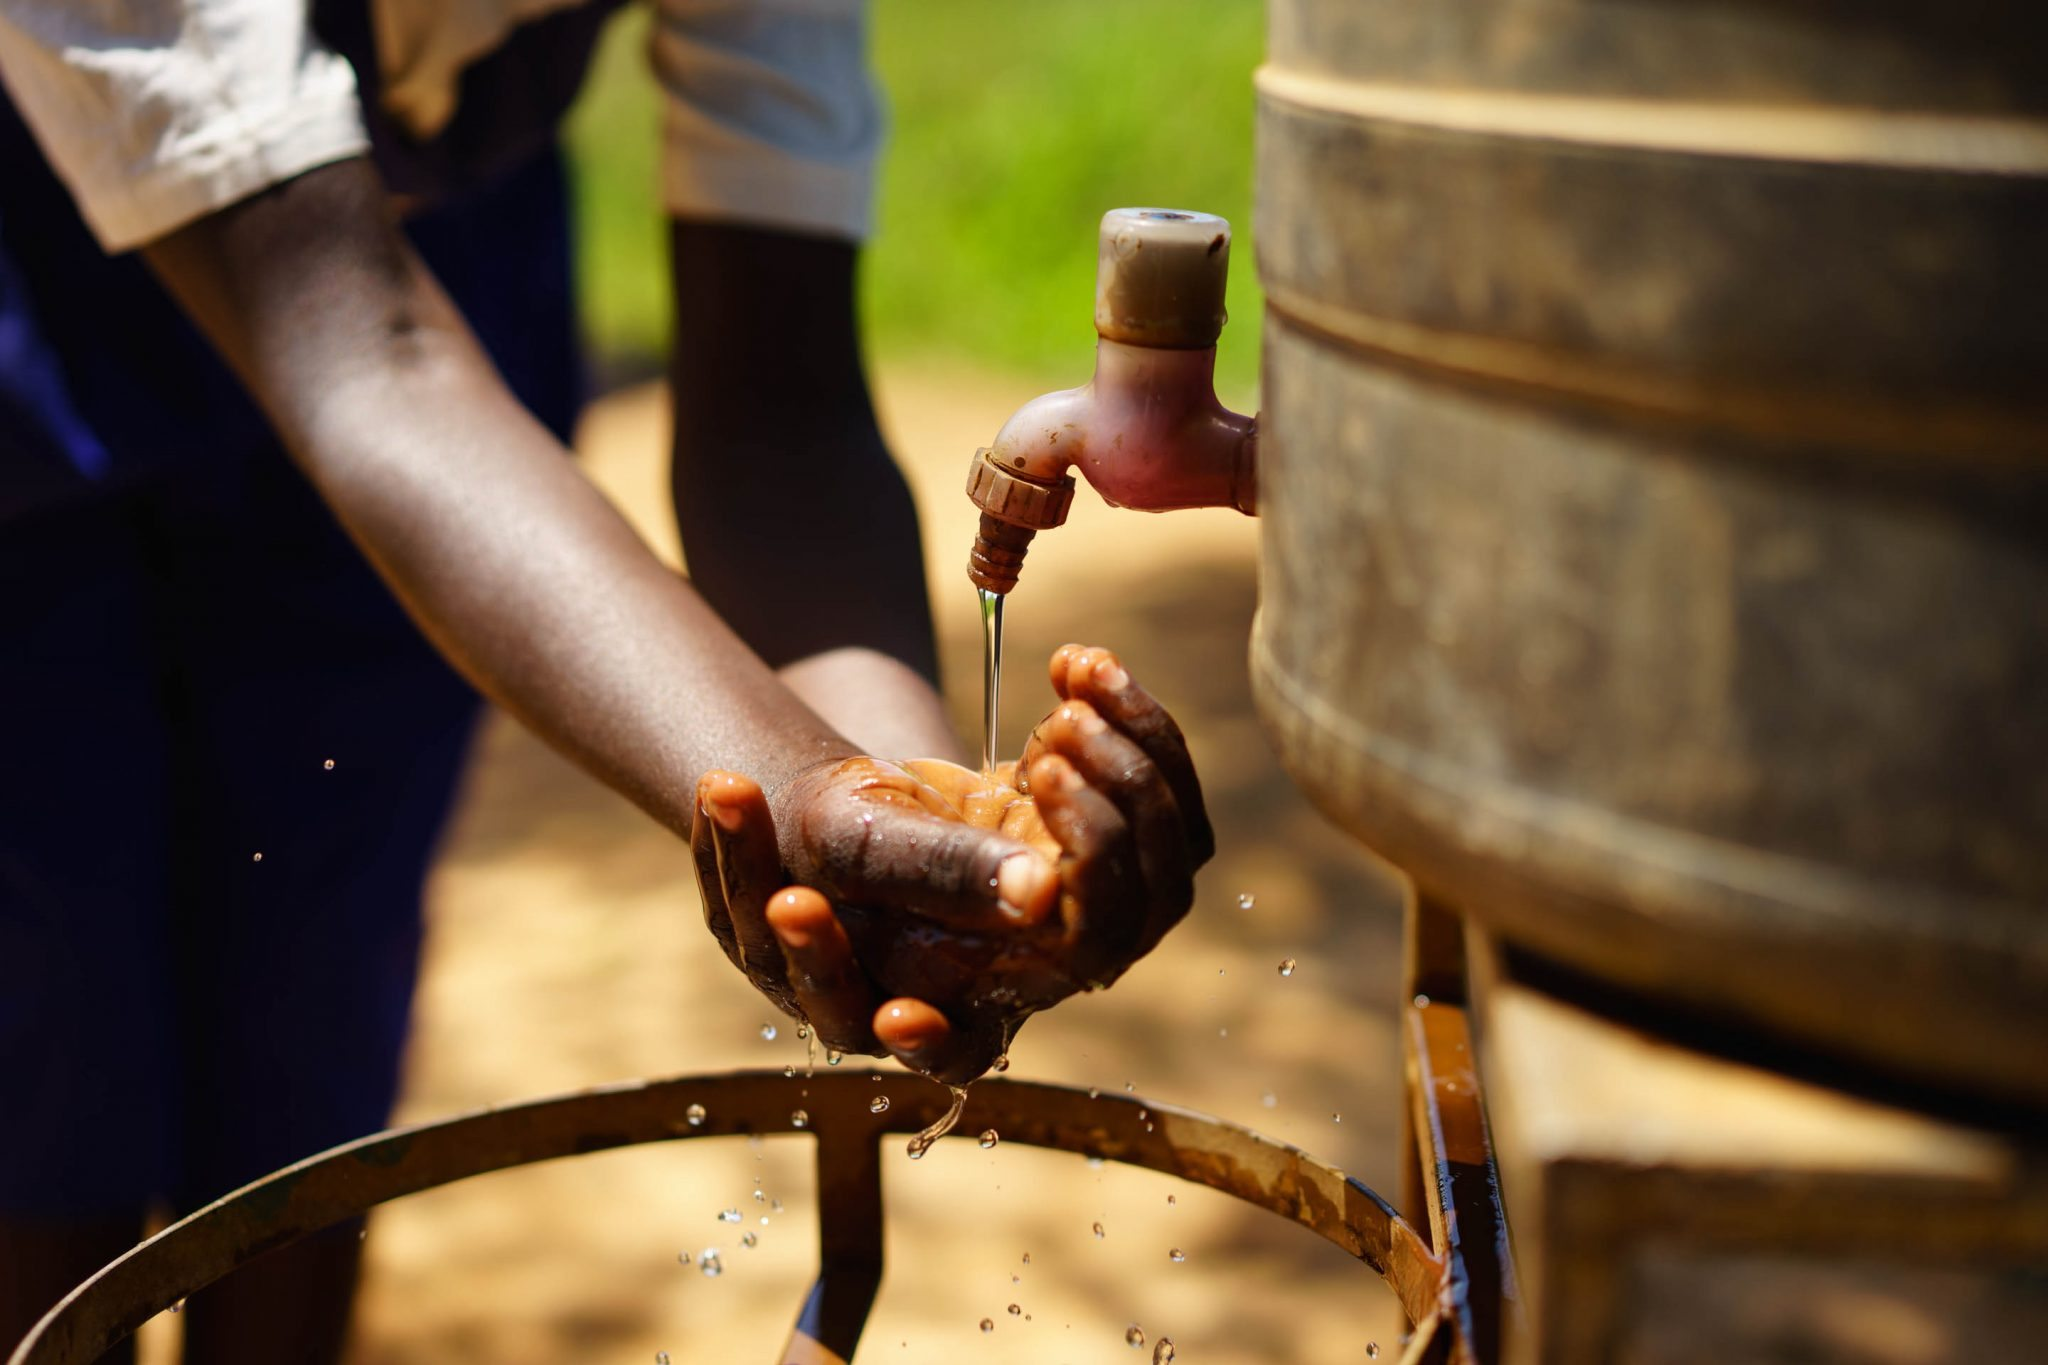 Uganda-hand-wash-1.jpg